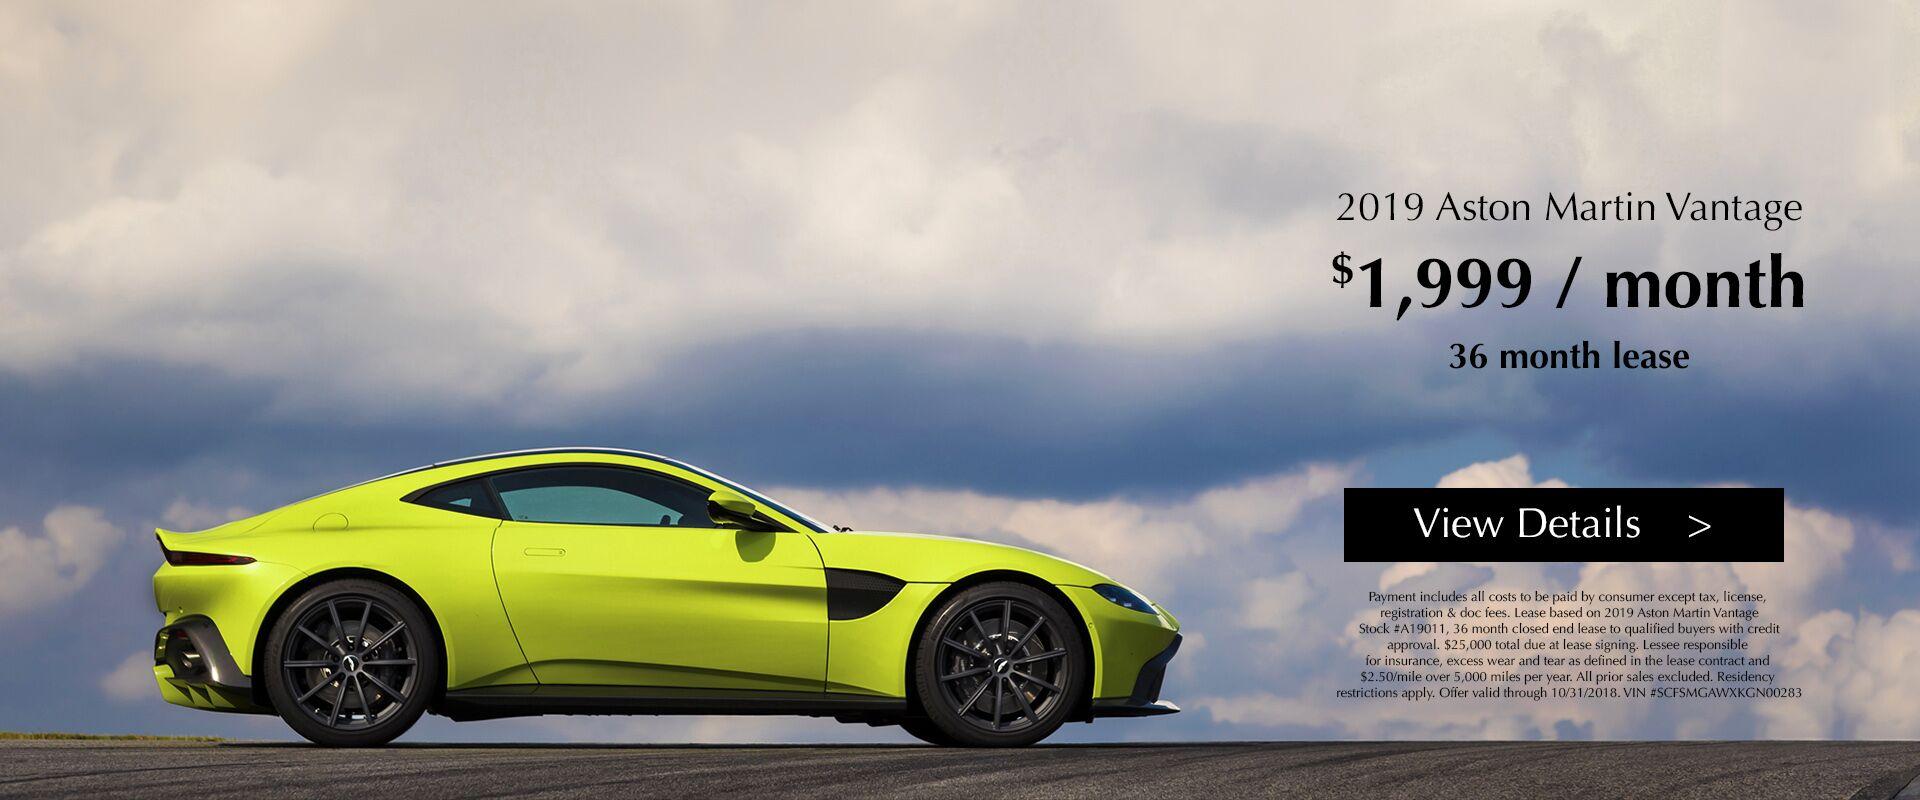 Aston Martin Bentley Bugatti Lamborghini RollsRoyce Dealership - Aston martin walnut creek